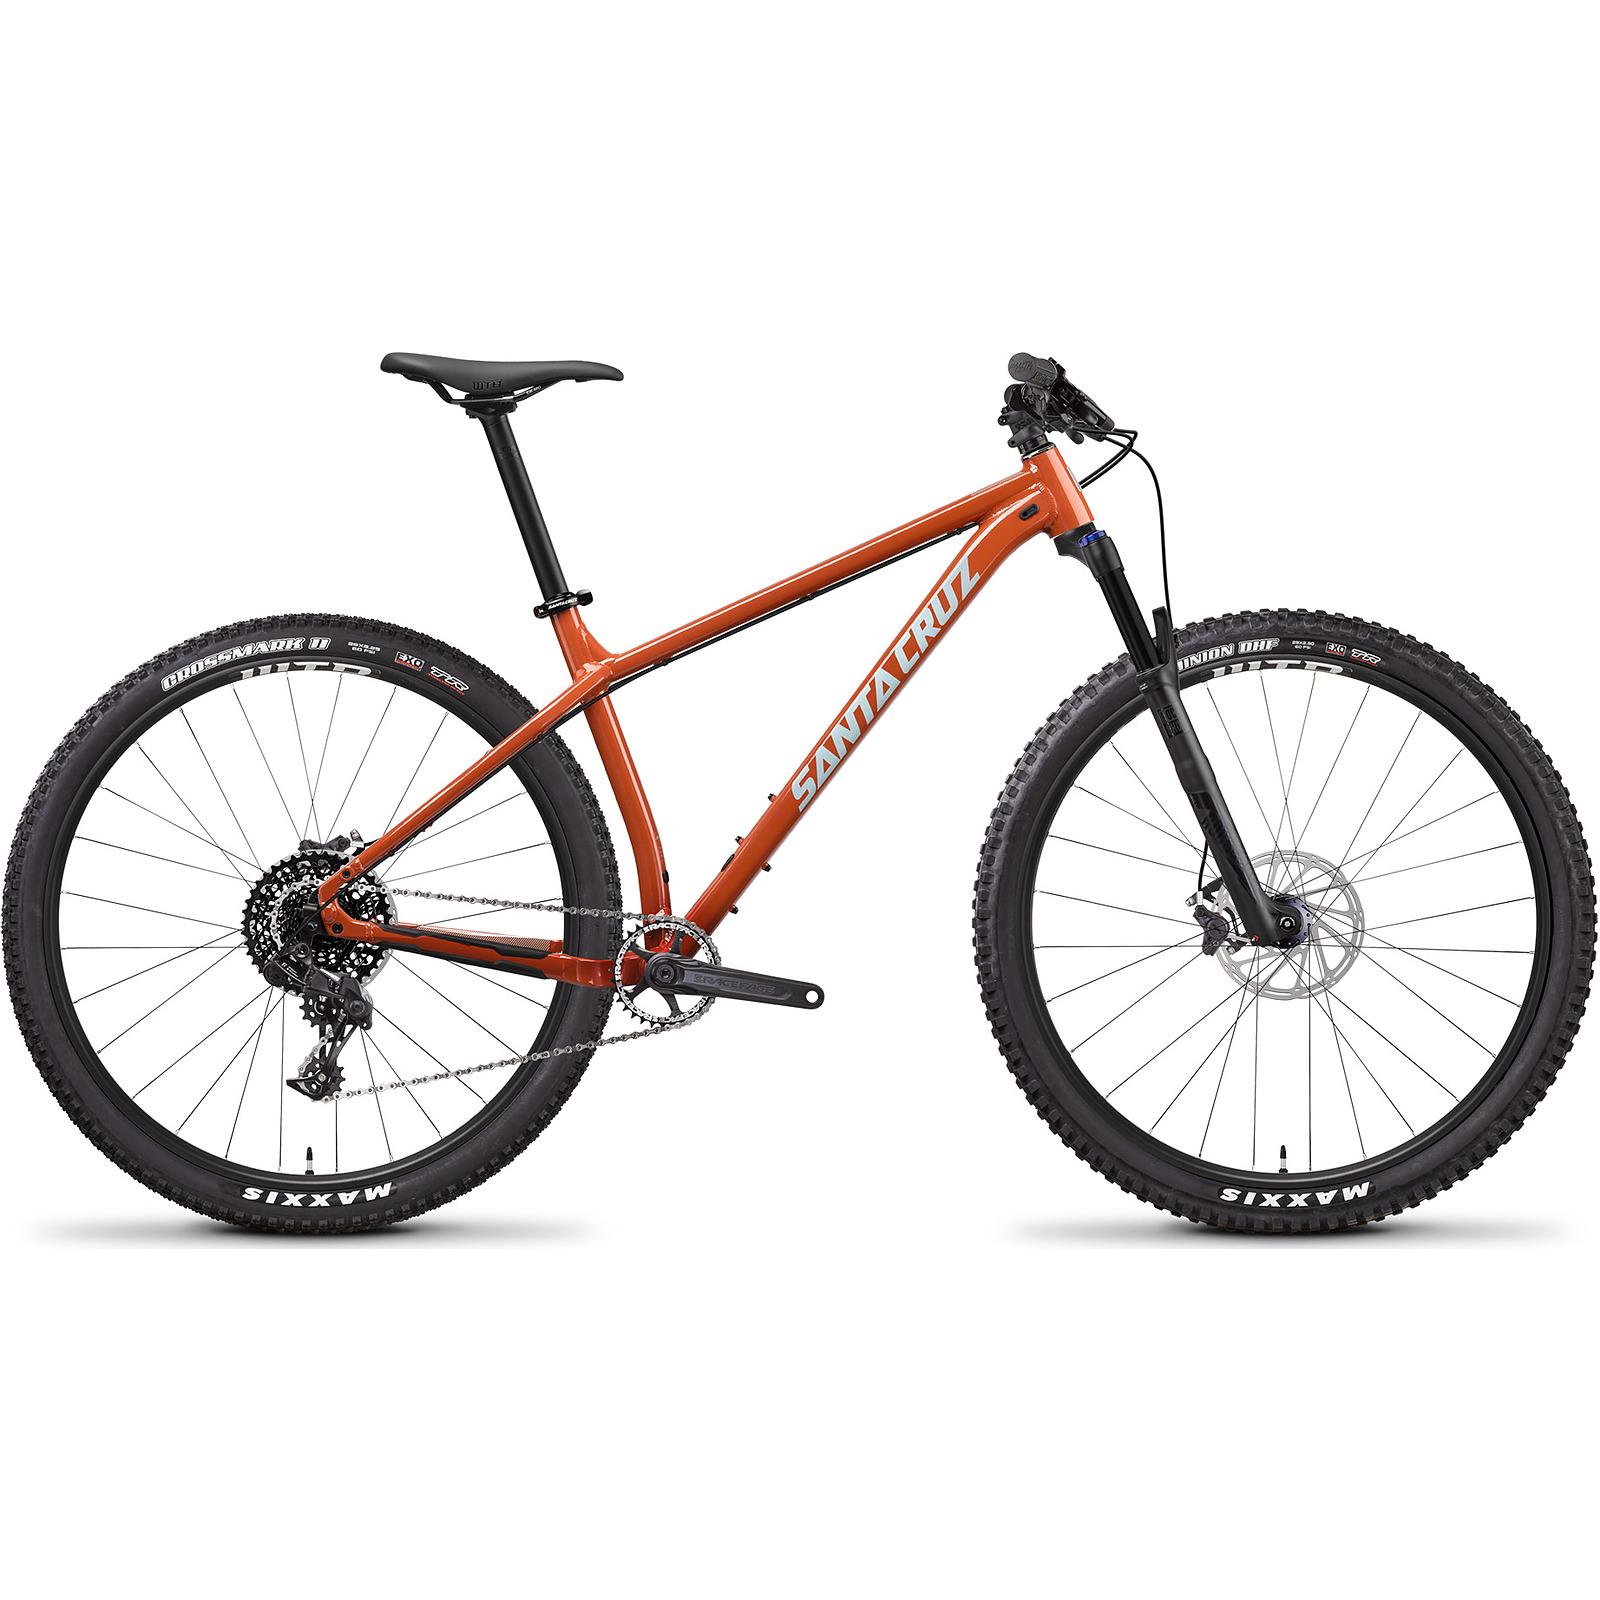 santa-cruz-2019-chameleon-a-d-29-bike-orange.jpg